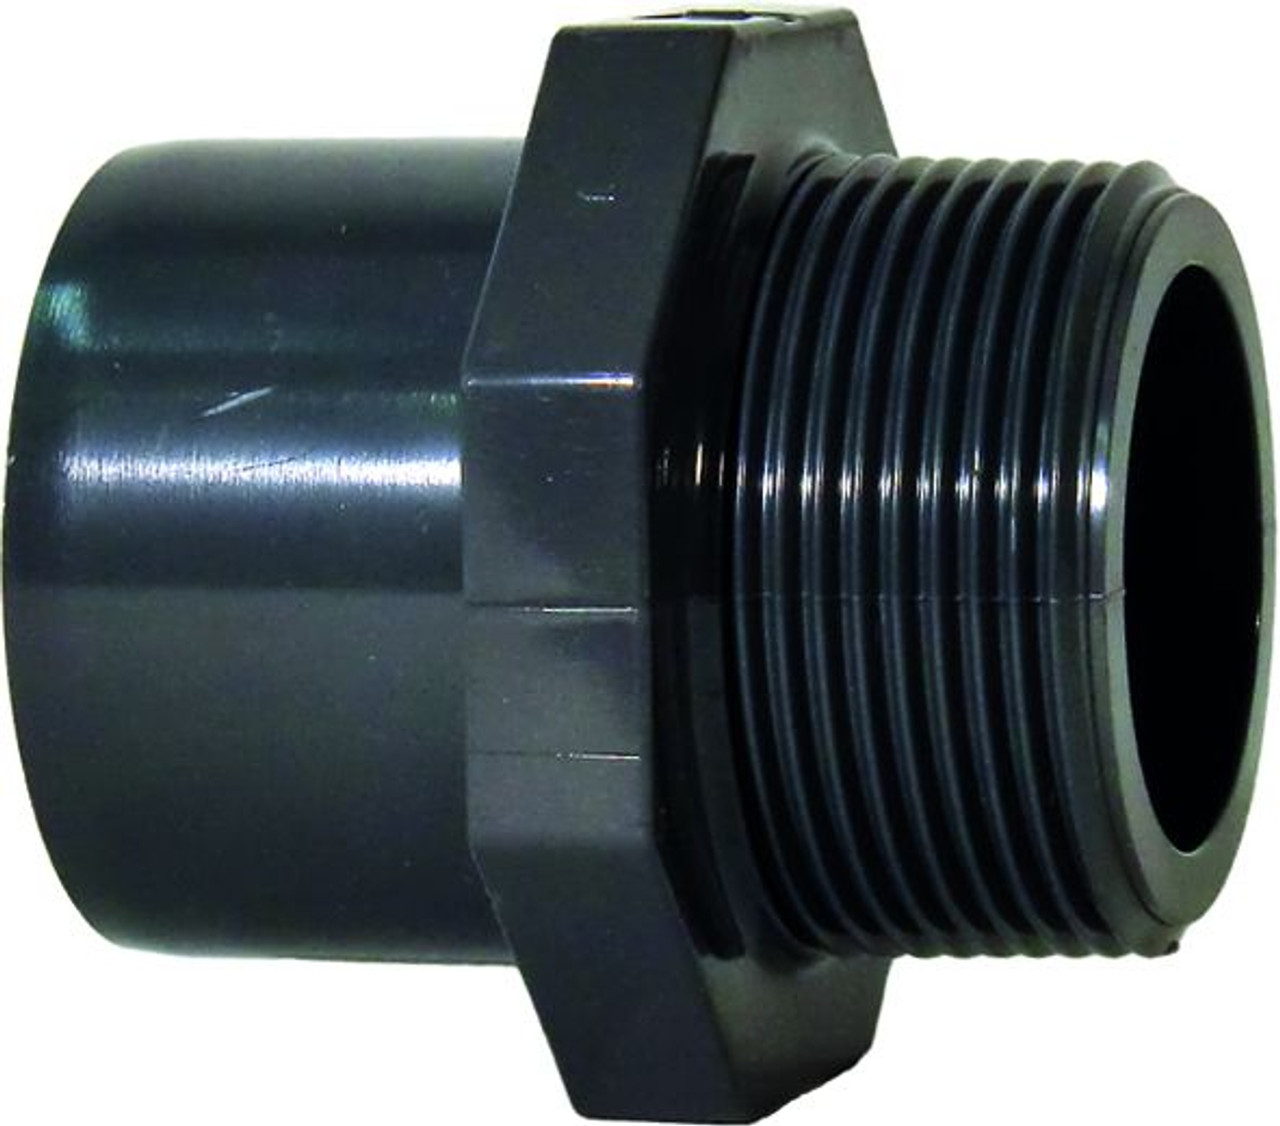 "+GF+ | Male Thread Adapter PVC-U 50mm x R2"" (721910561)"